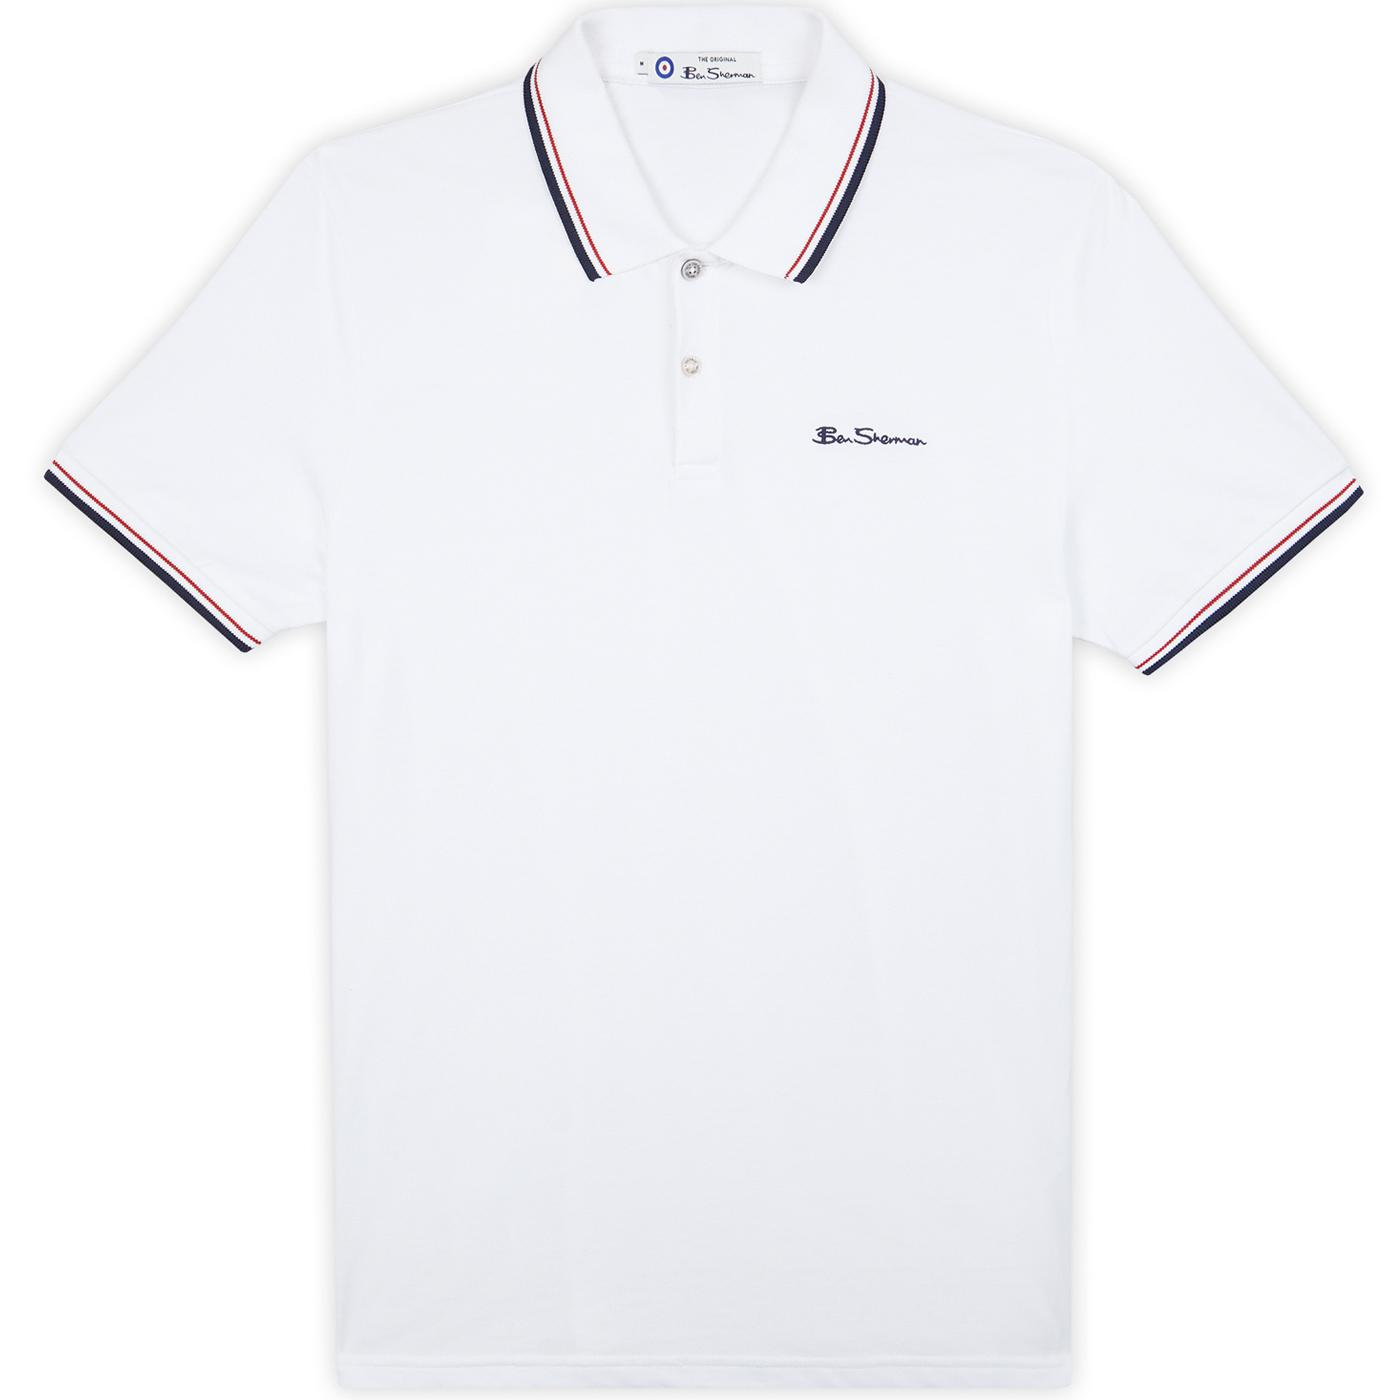 BEN SHERMAN Mod Tipped Signature Polo Top (White)